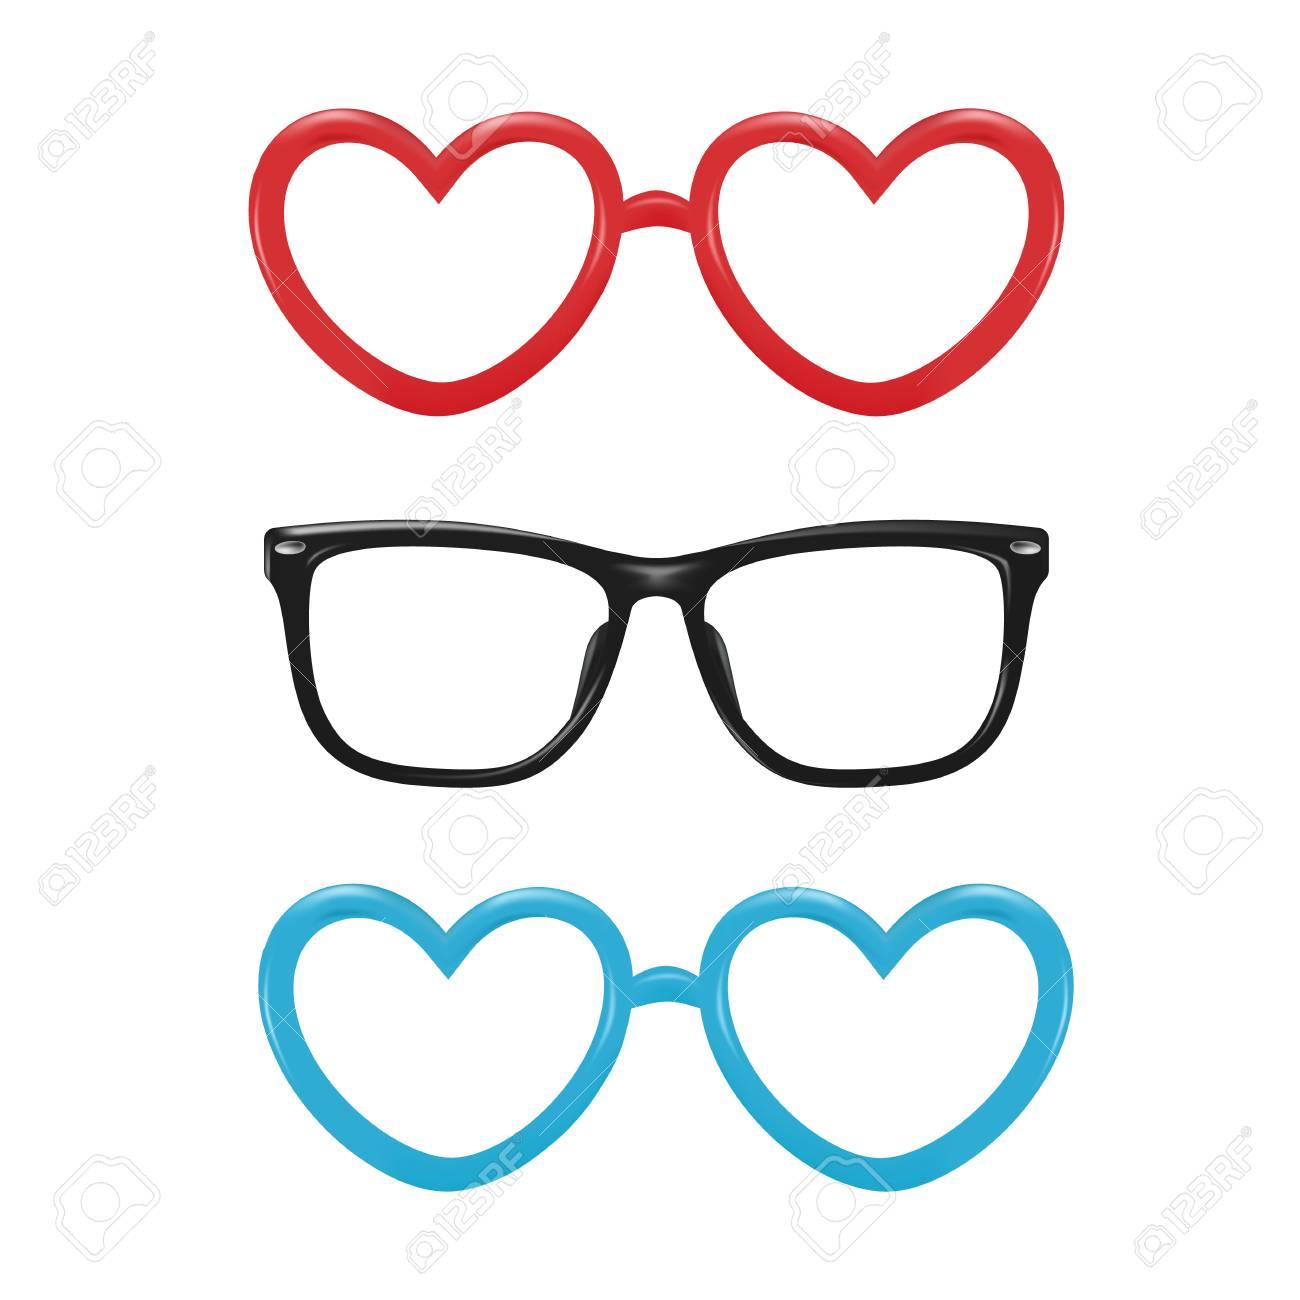 d77788f0239 A Vector realistic eyeglasses heart shape photo booth Stock Vector -  96173838